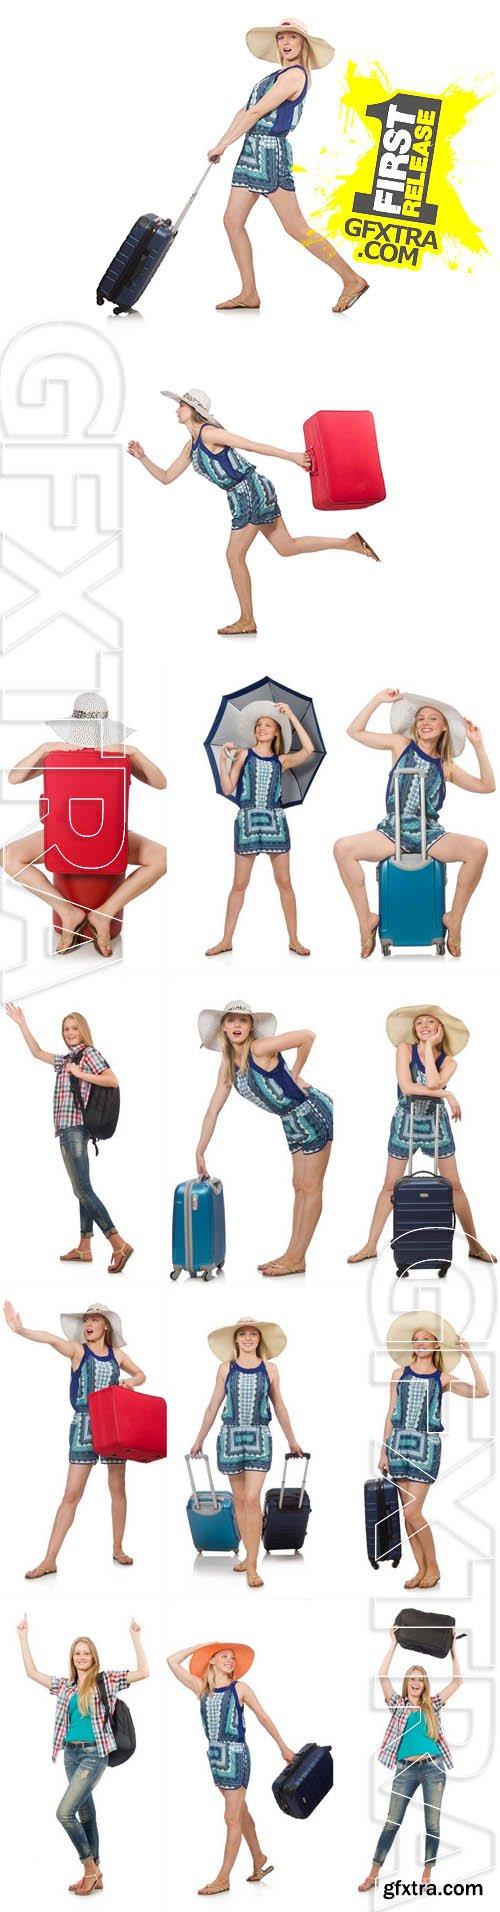 Stock Photos - Woman with Travel Bag